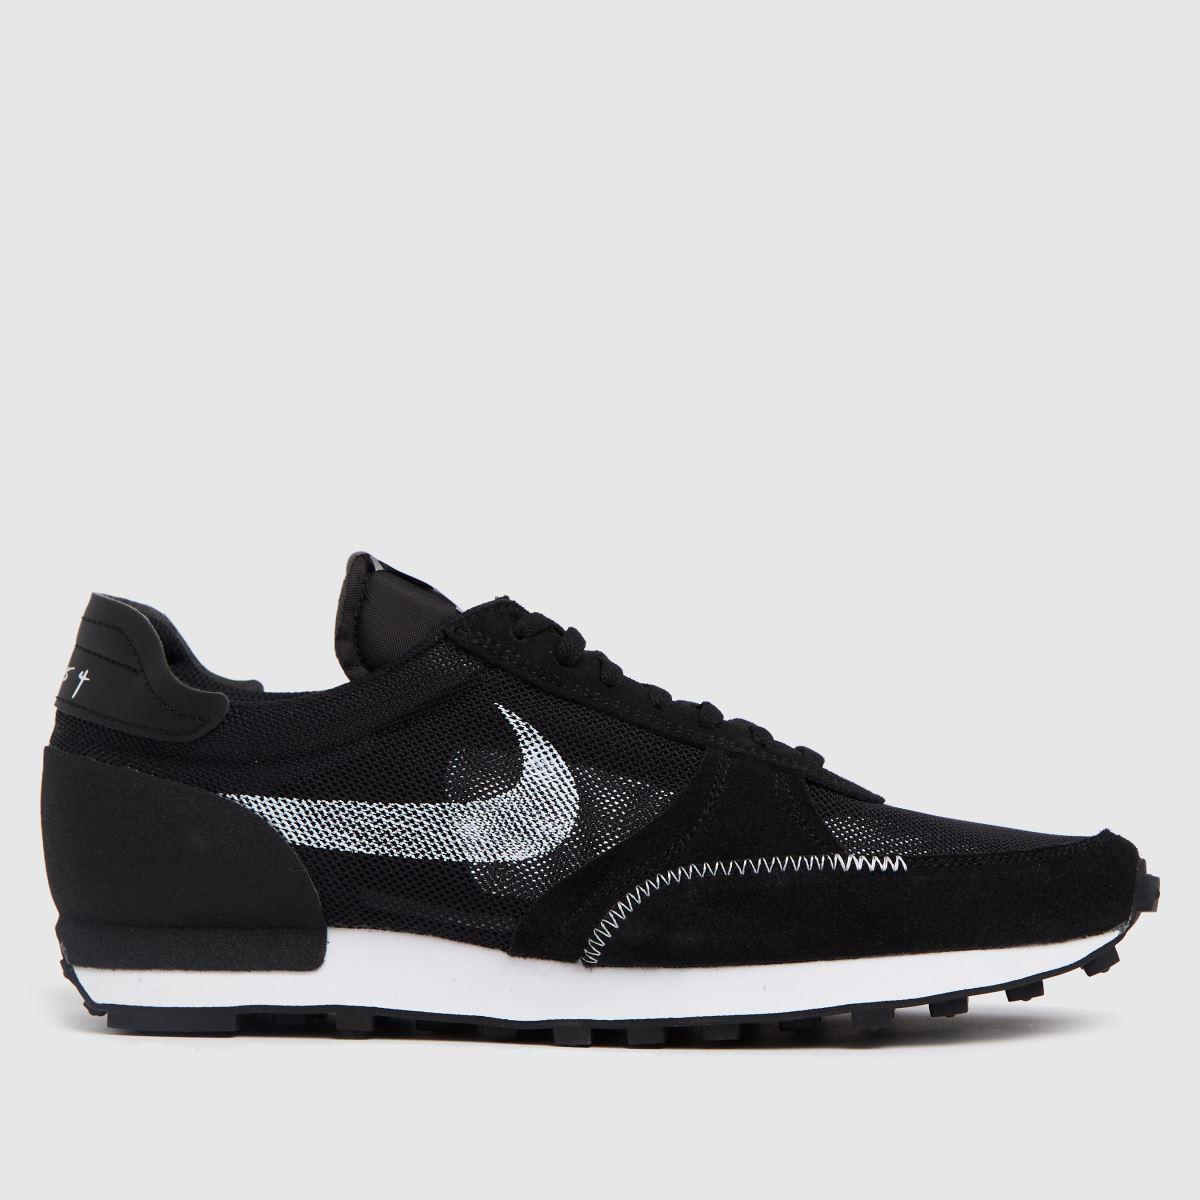 Nike Black & White Dbreak-type Trainers